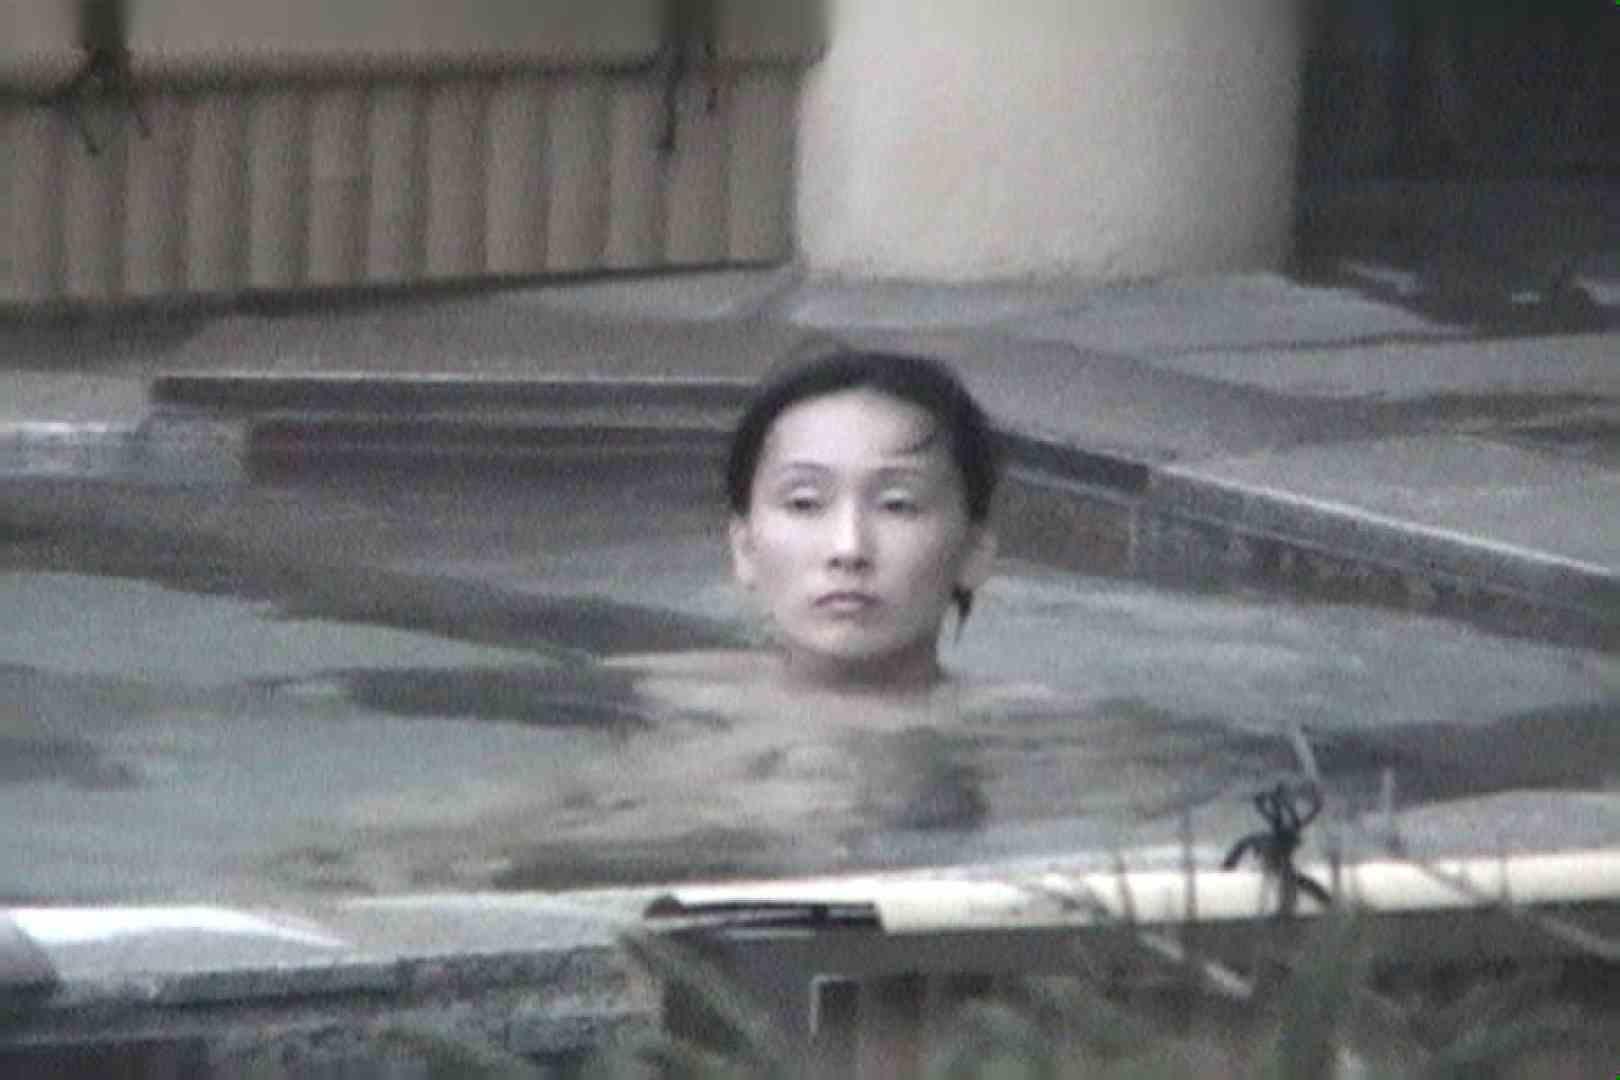 Aquaな露天風呂Vol.557 露天 | OL女体  40連発 1